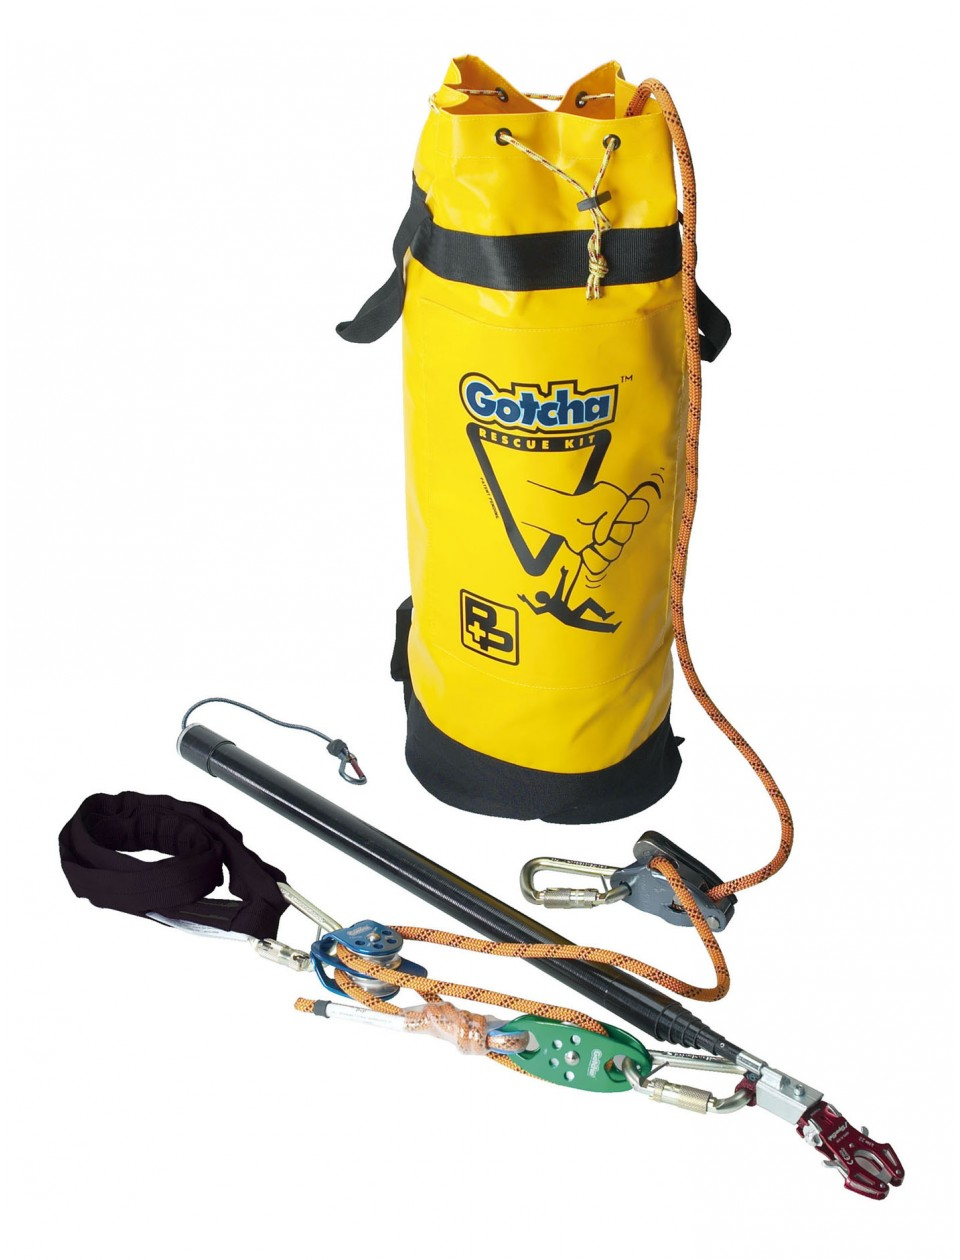 P P 90293 Gotcha Rescue Kit 50m